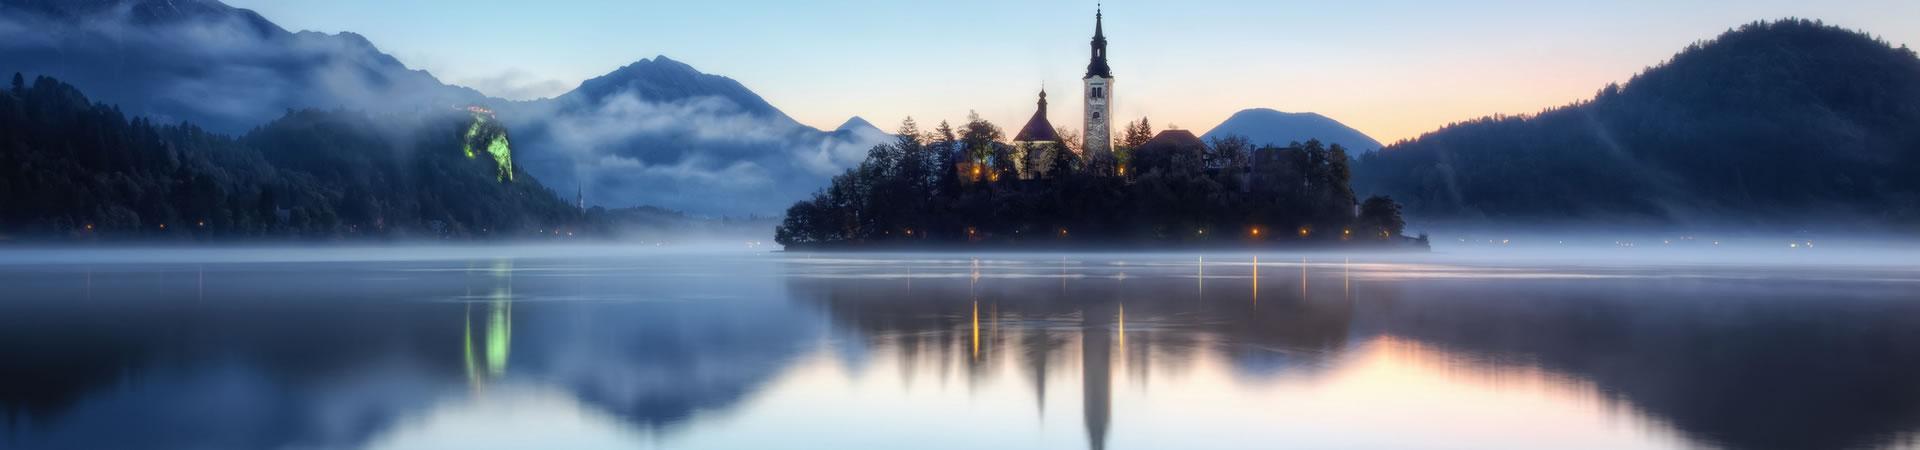 slovenia-lake-bledsoe-fog-landscape